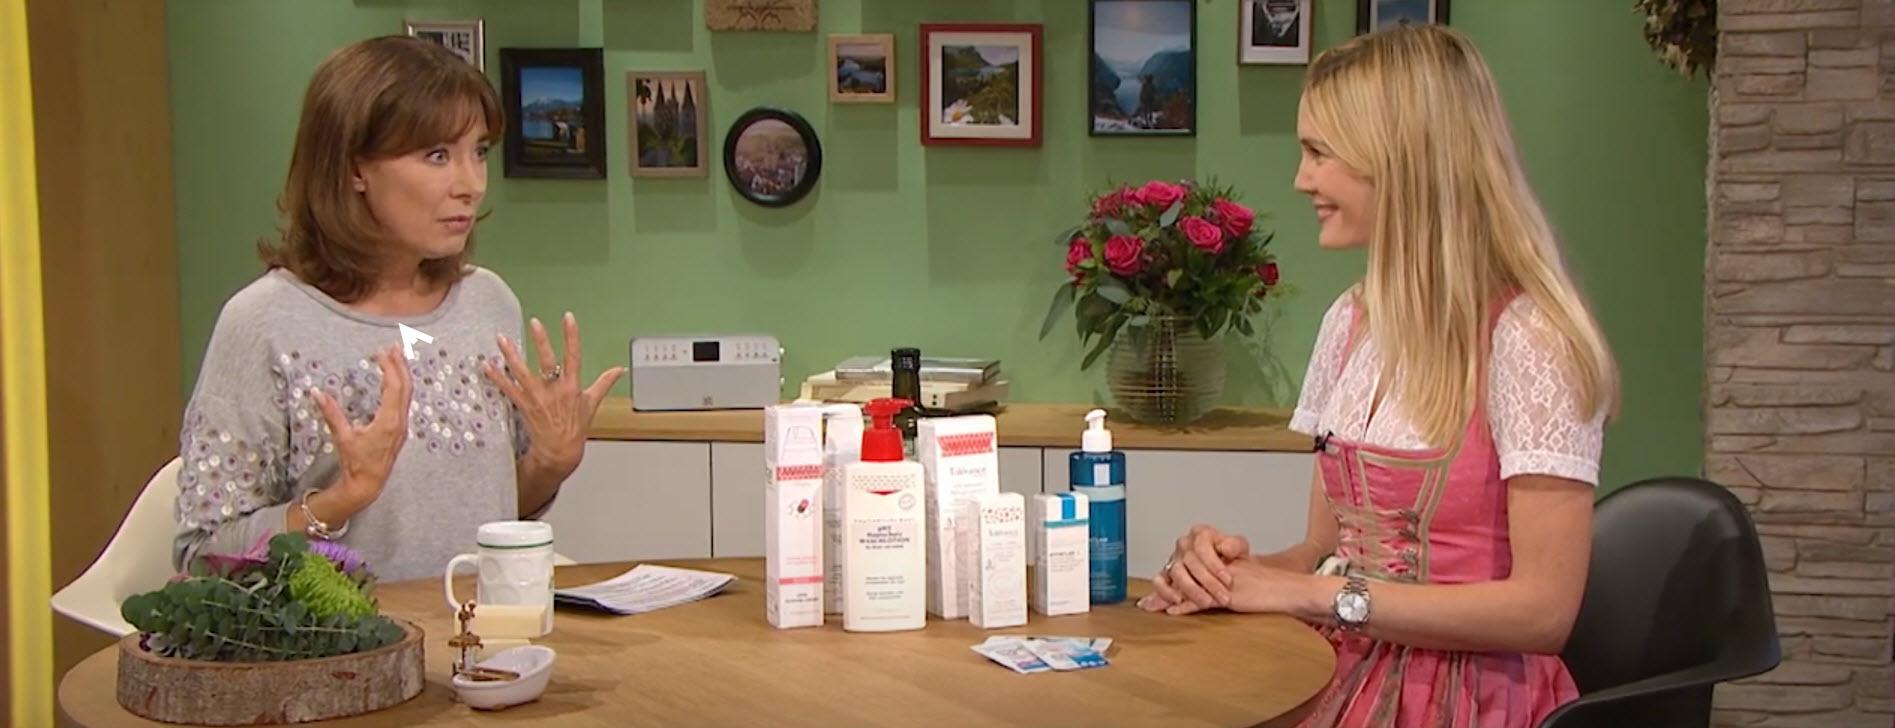 Hautpflege Fehler